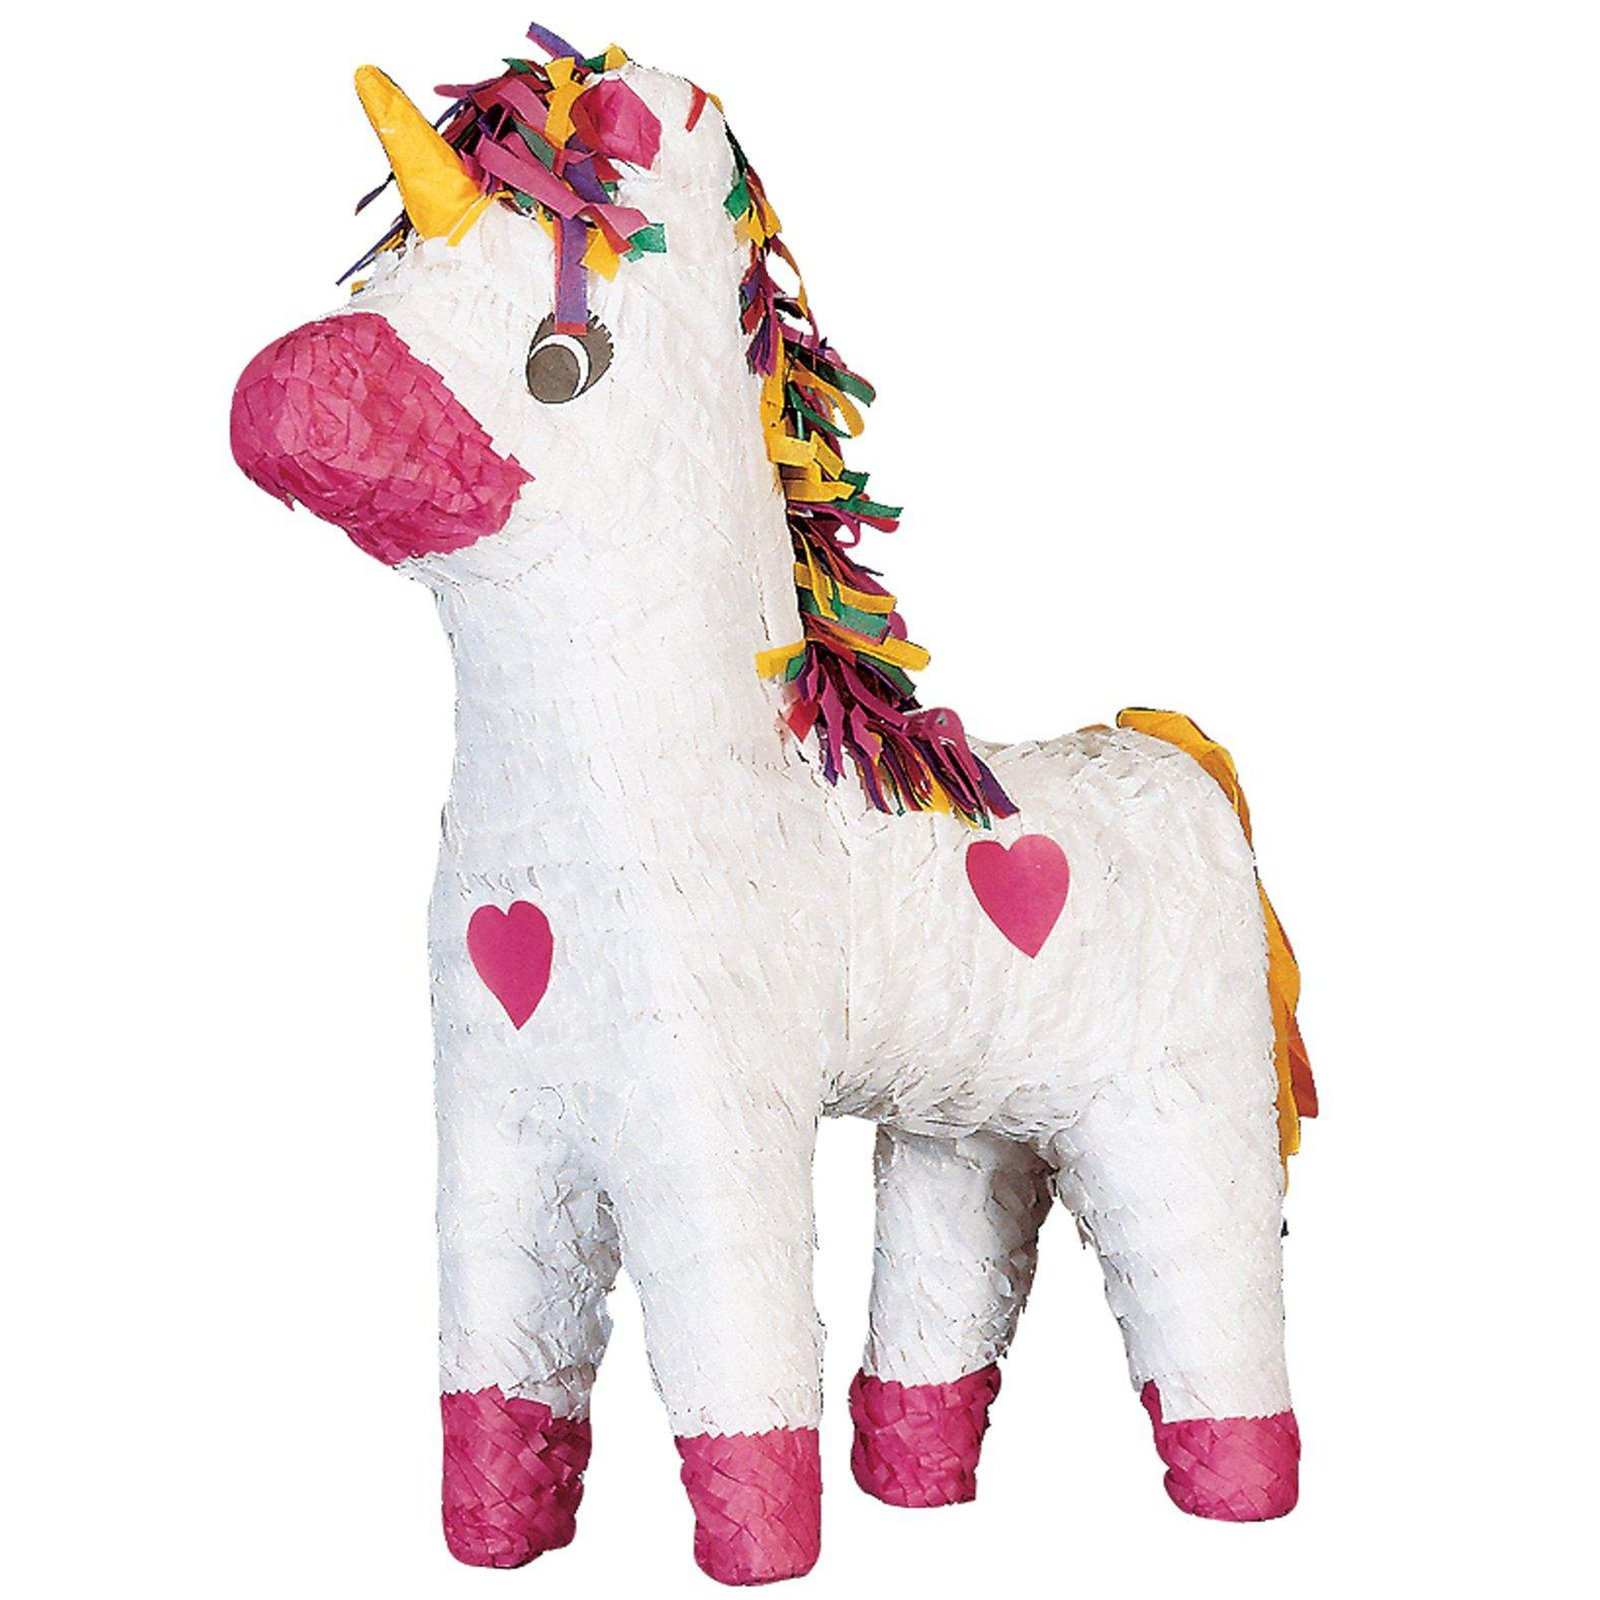 Ya Otta Pinata Unicorn Pinata by Ya Otta Pinata